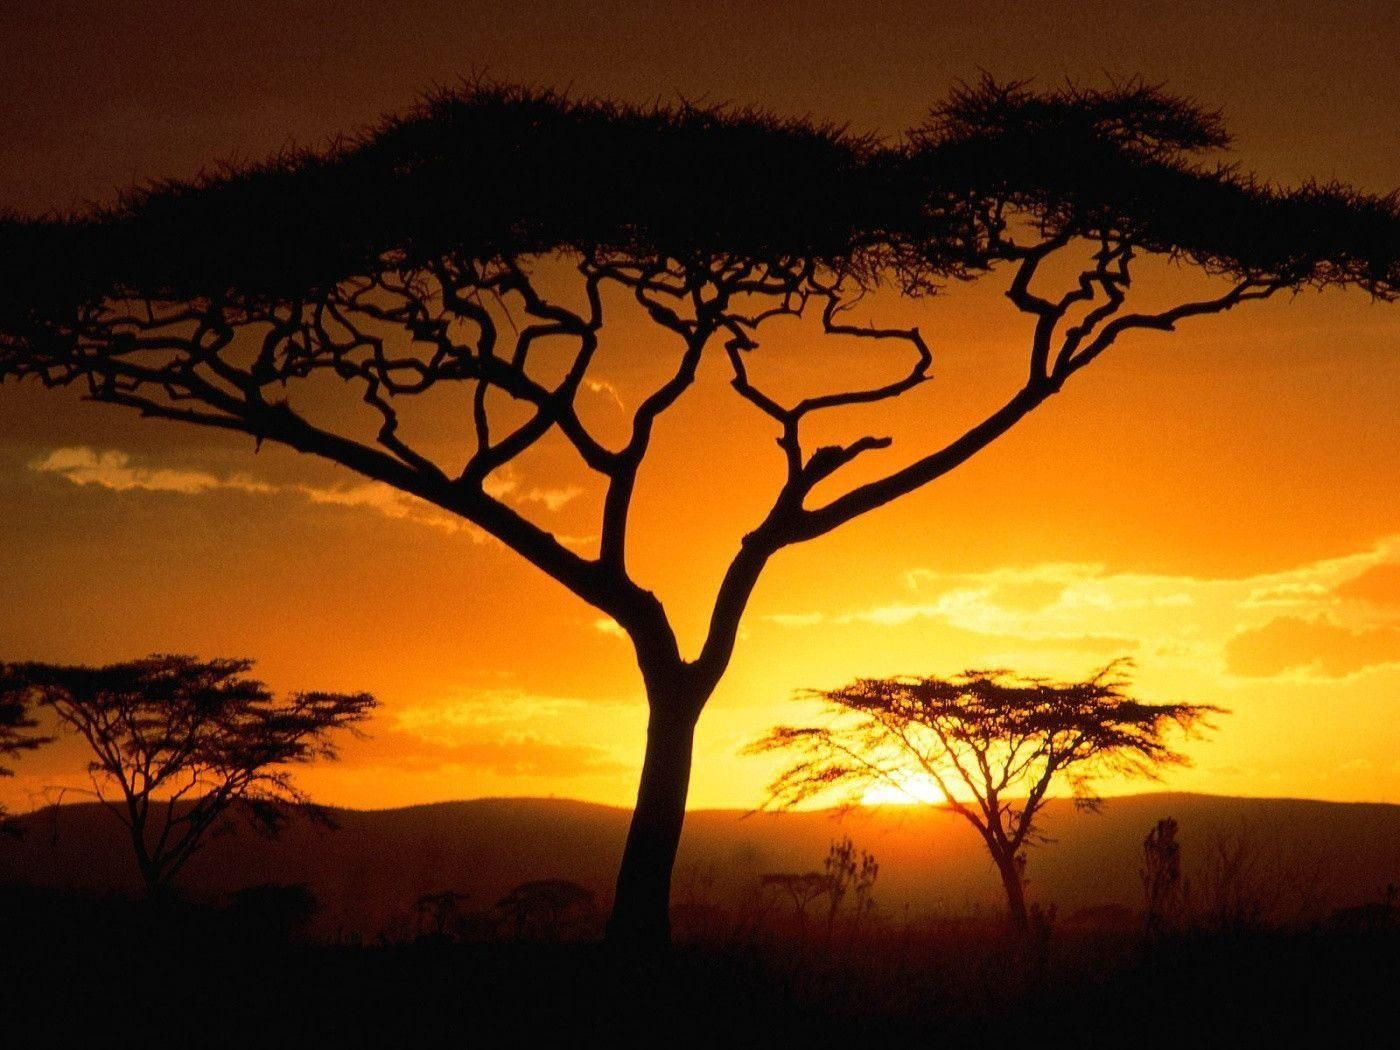 Africa Sunset Wallpapers High Definition Africa Sunset